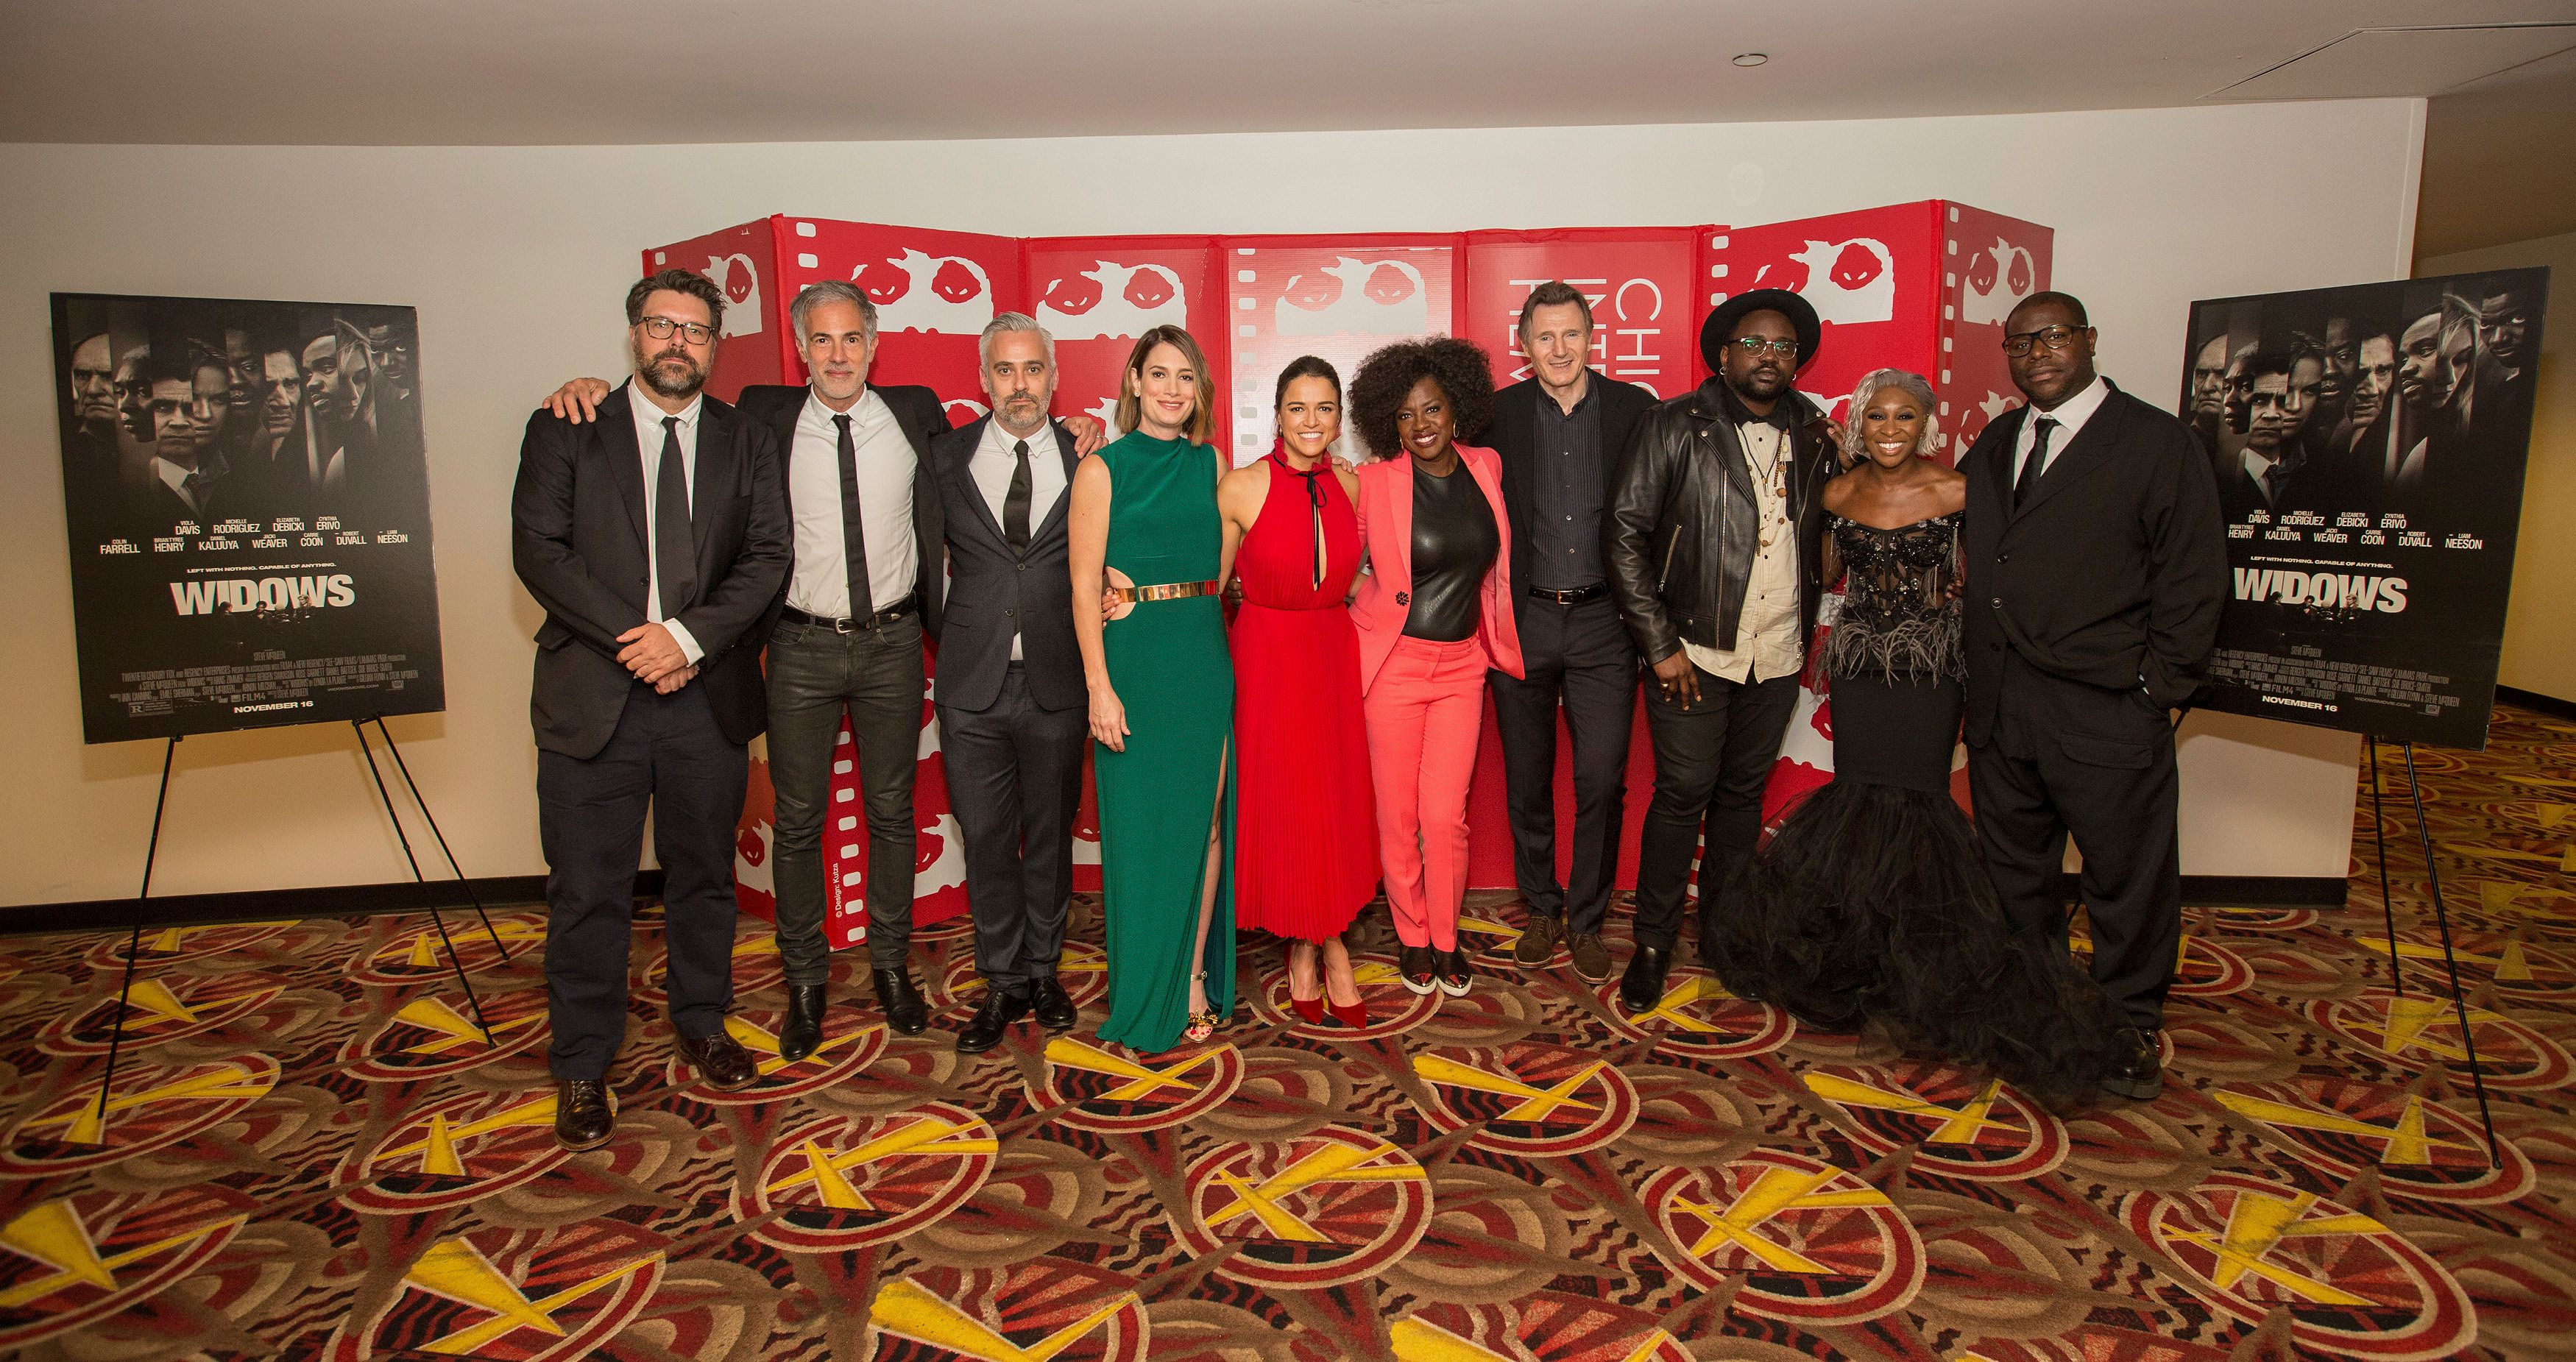 Michelle with Widows co-stars Viola Davis and Liam